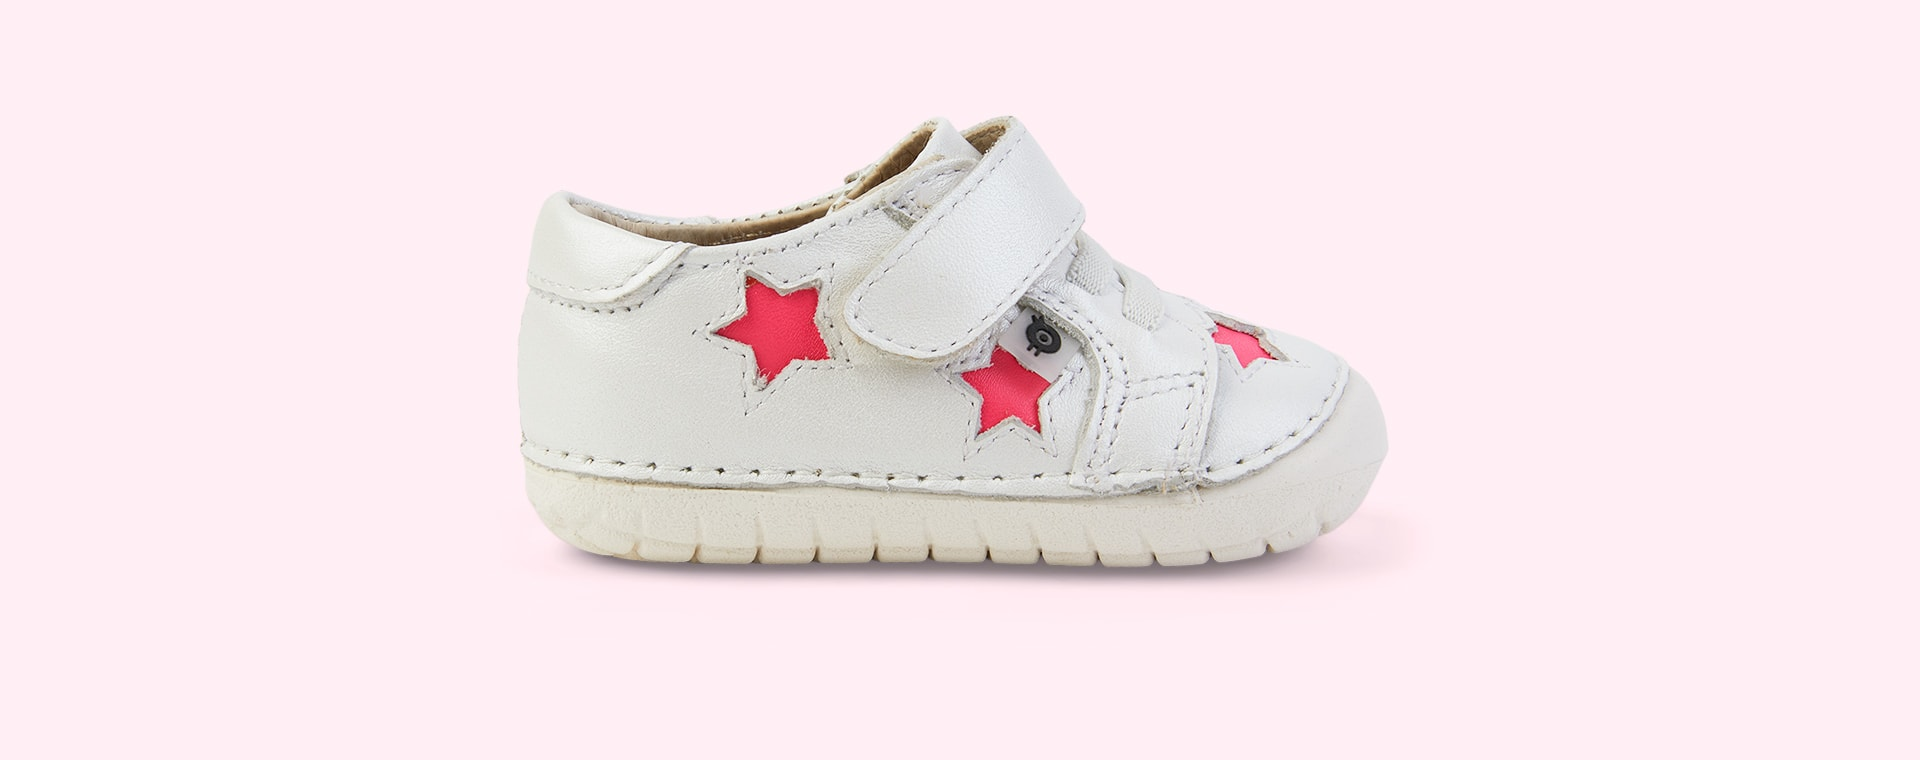 Nacardo Blanco/ Neon Pink old soles Starey Pave